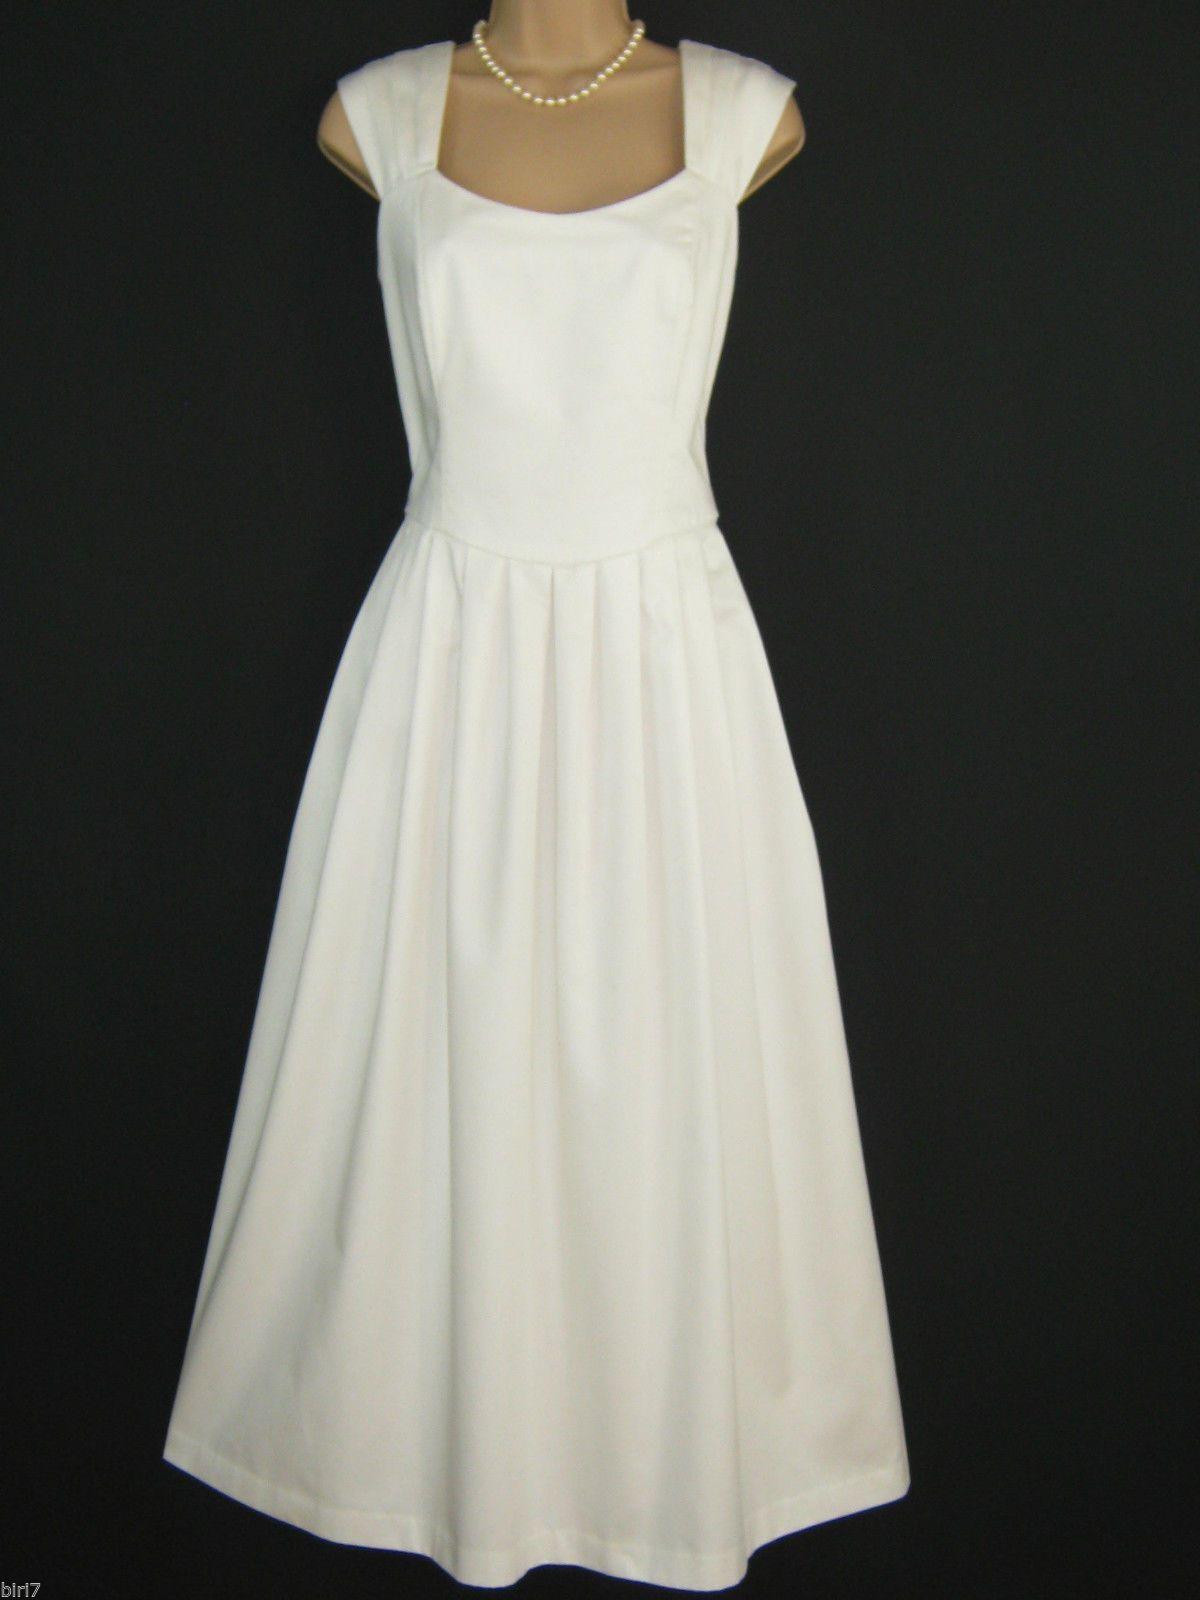 Laura ashley vintage summer white wedding / occasion dress & jacket ...